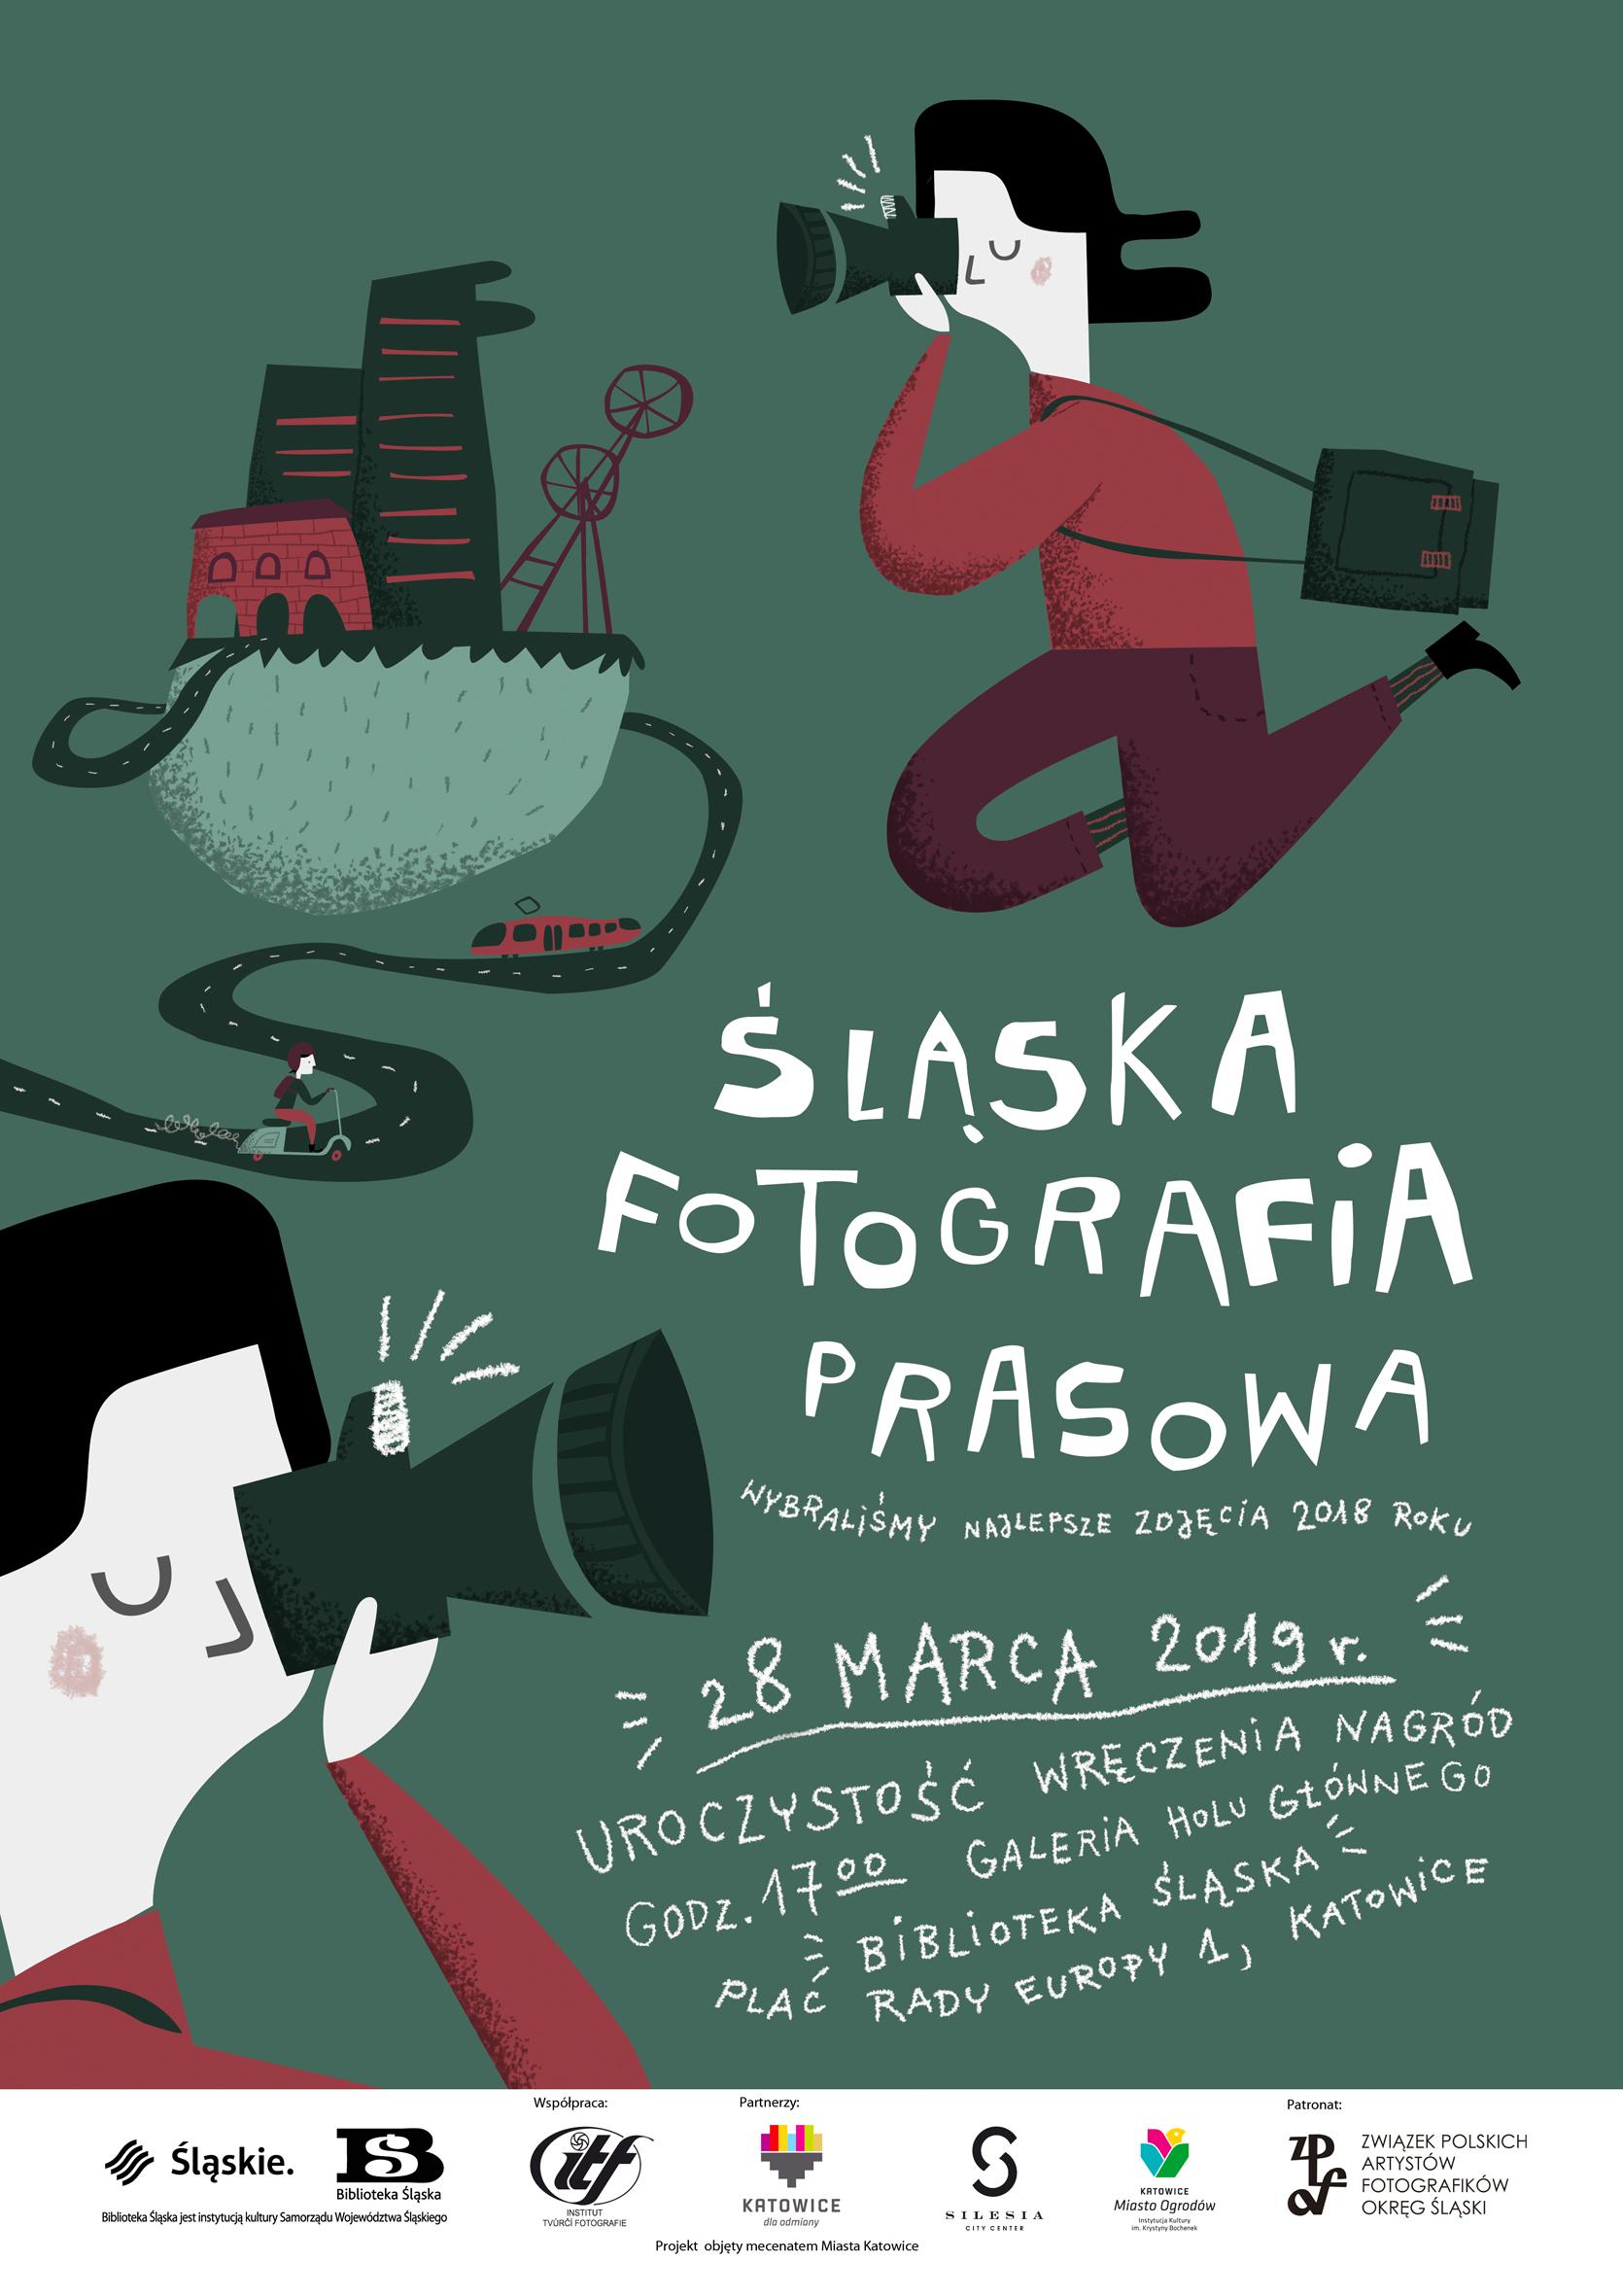 Plakat konkursu Śląska Fotografia Prasowa (źródło: materiały prasowe)